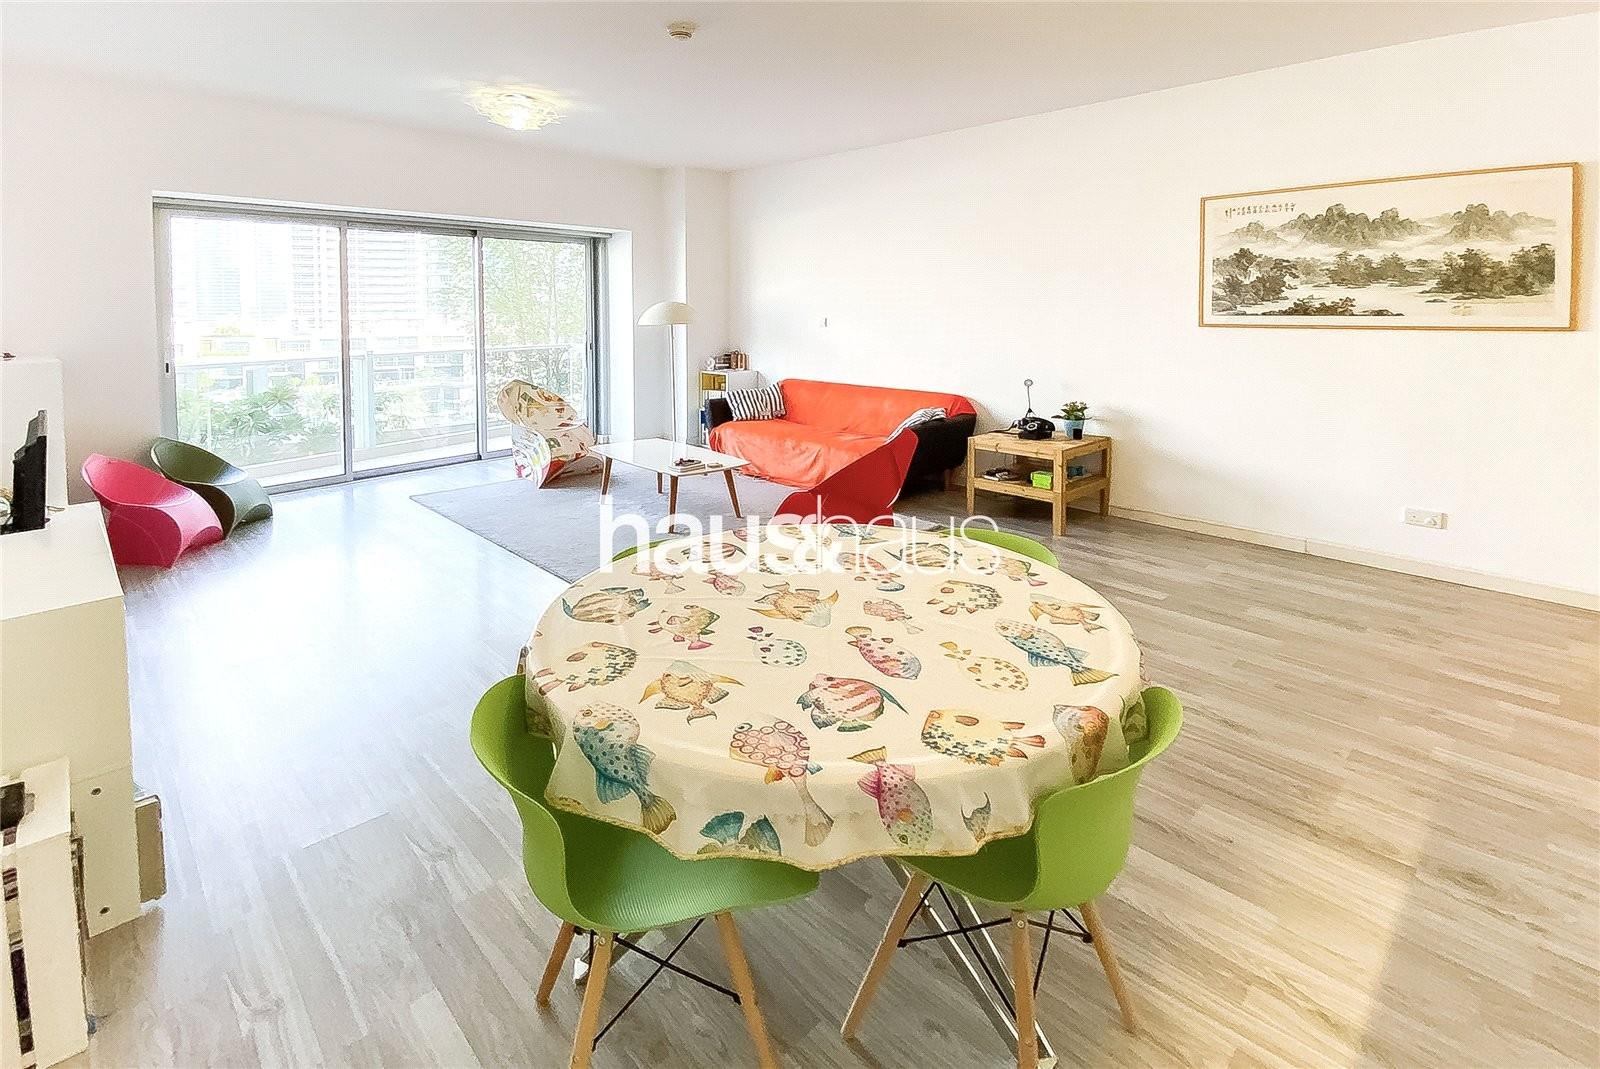 3 Bedroom | Maids | Full Marina Views